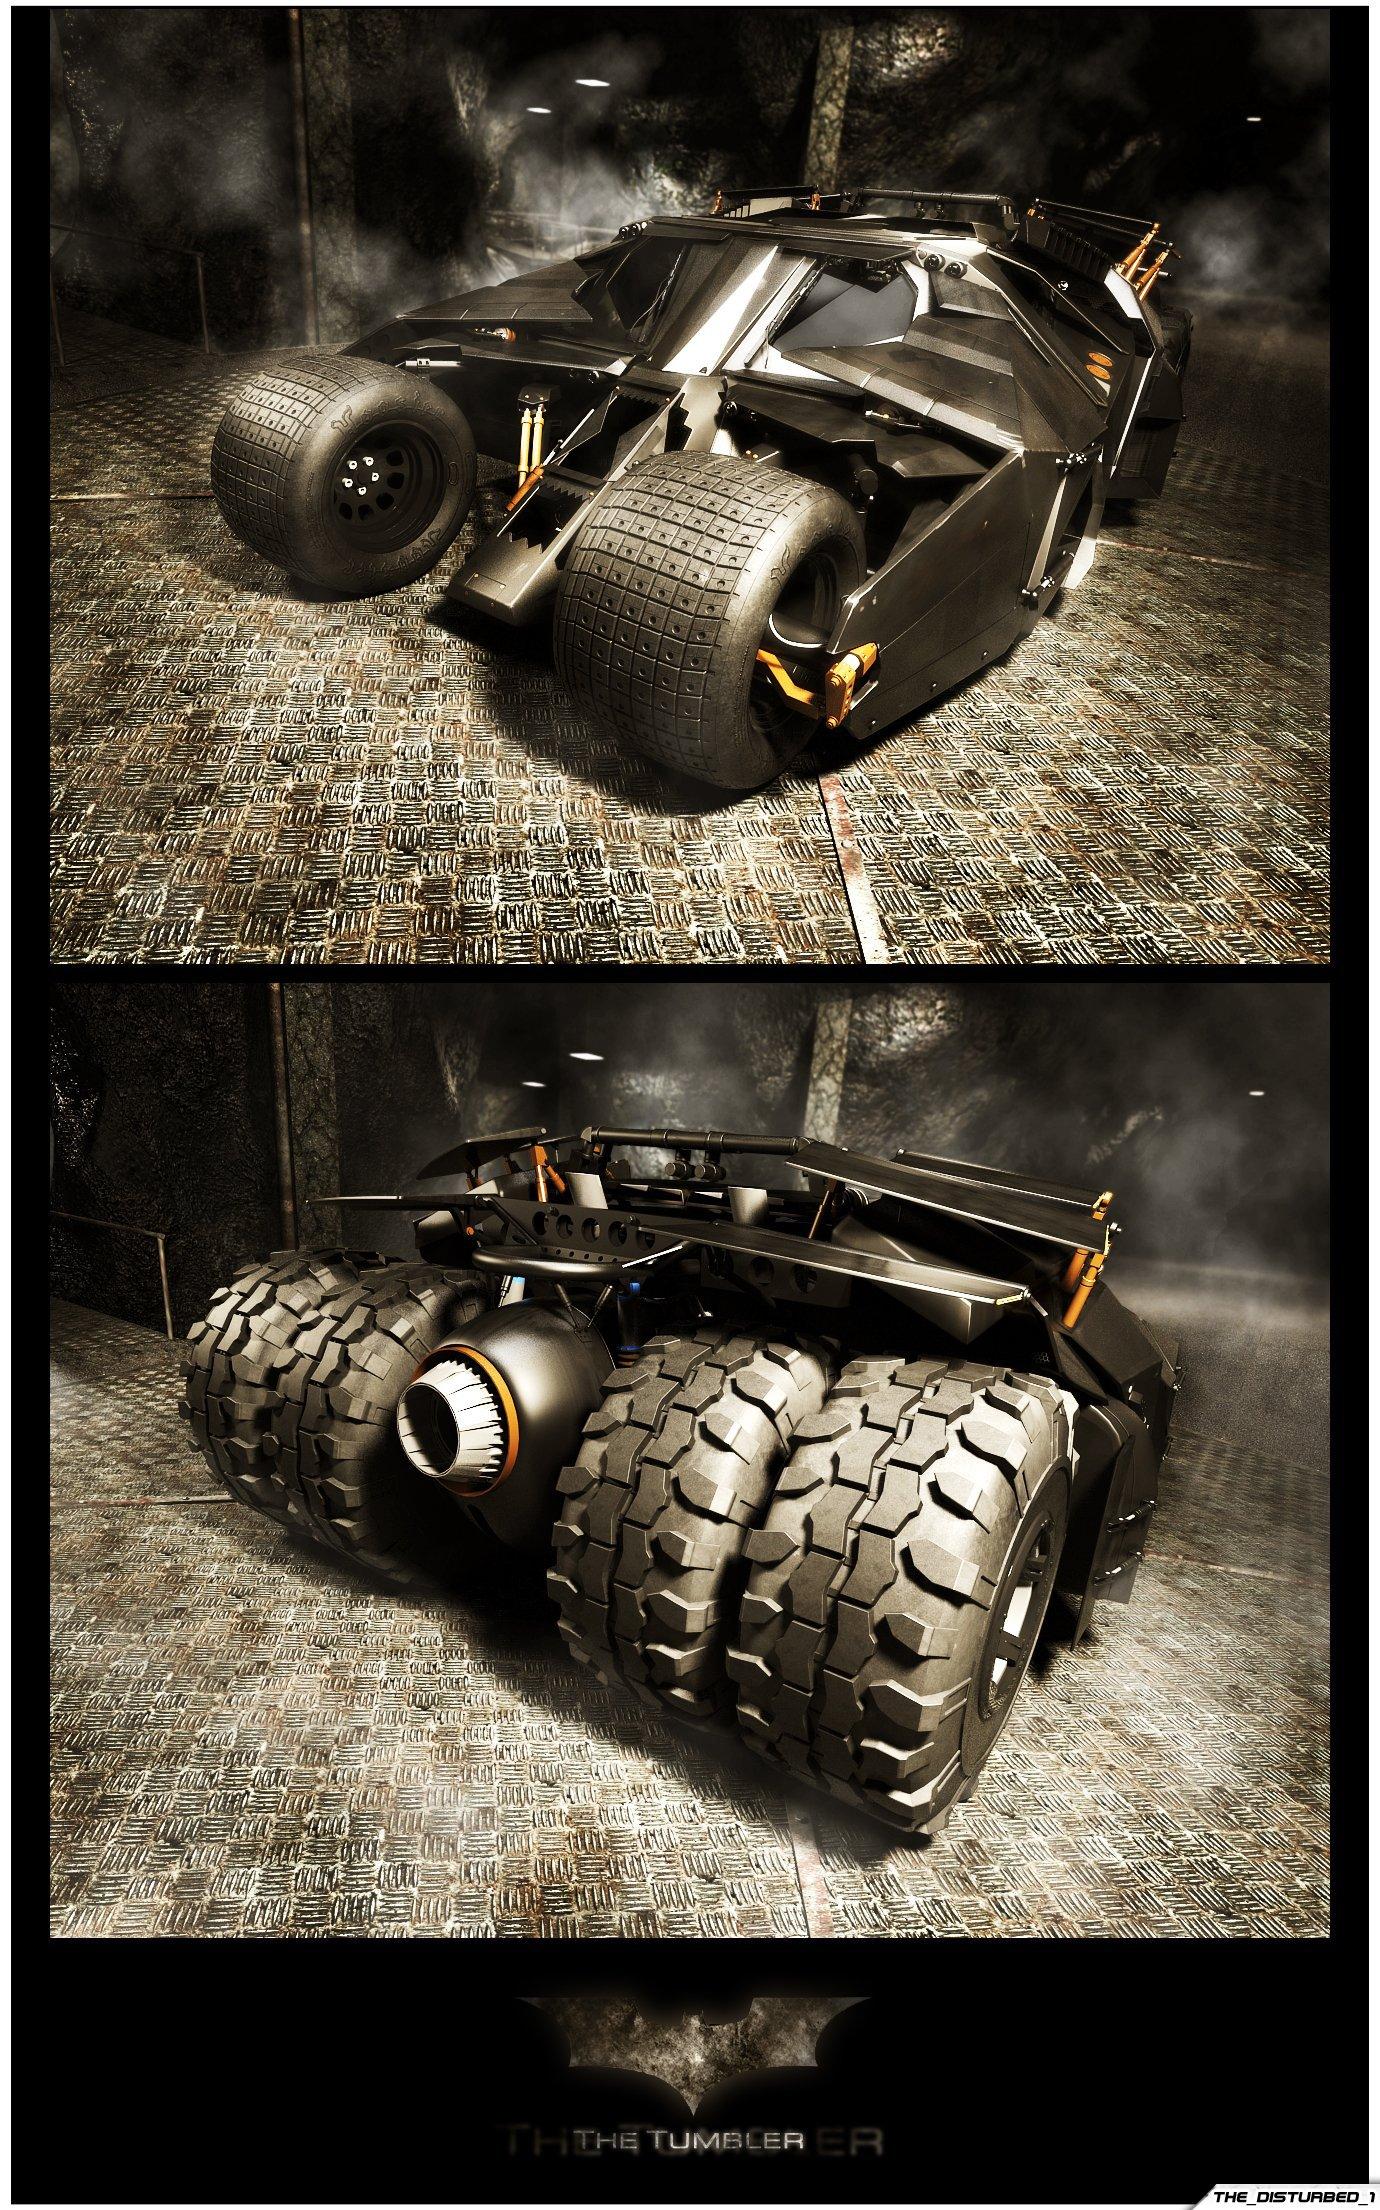 Batmobile - The Tumbler